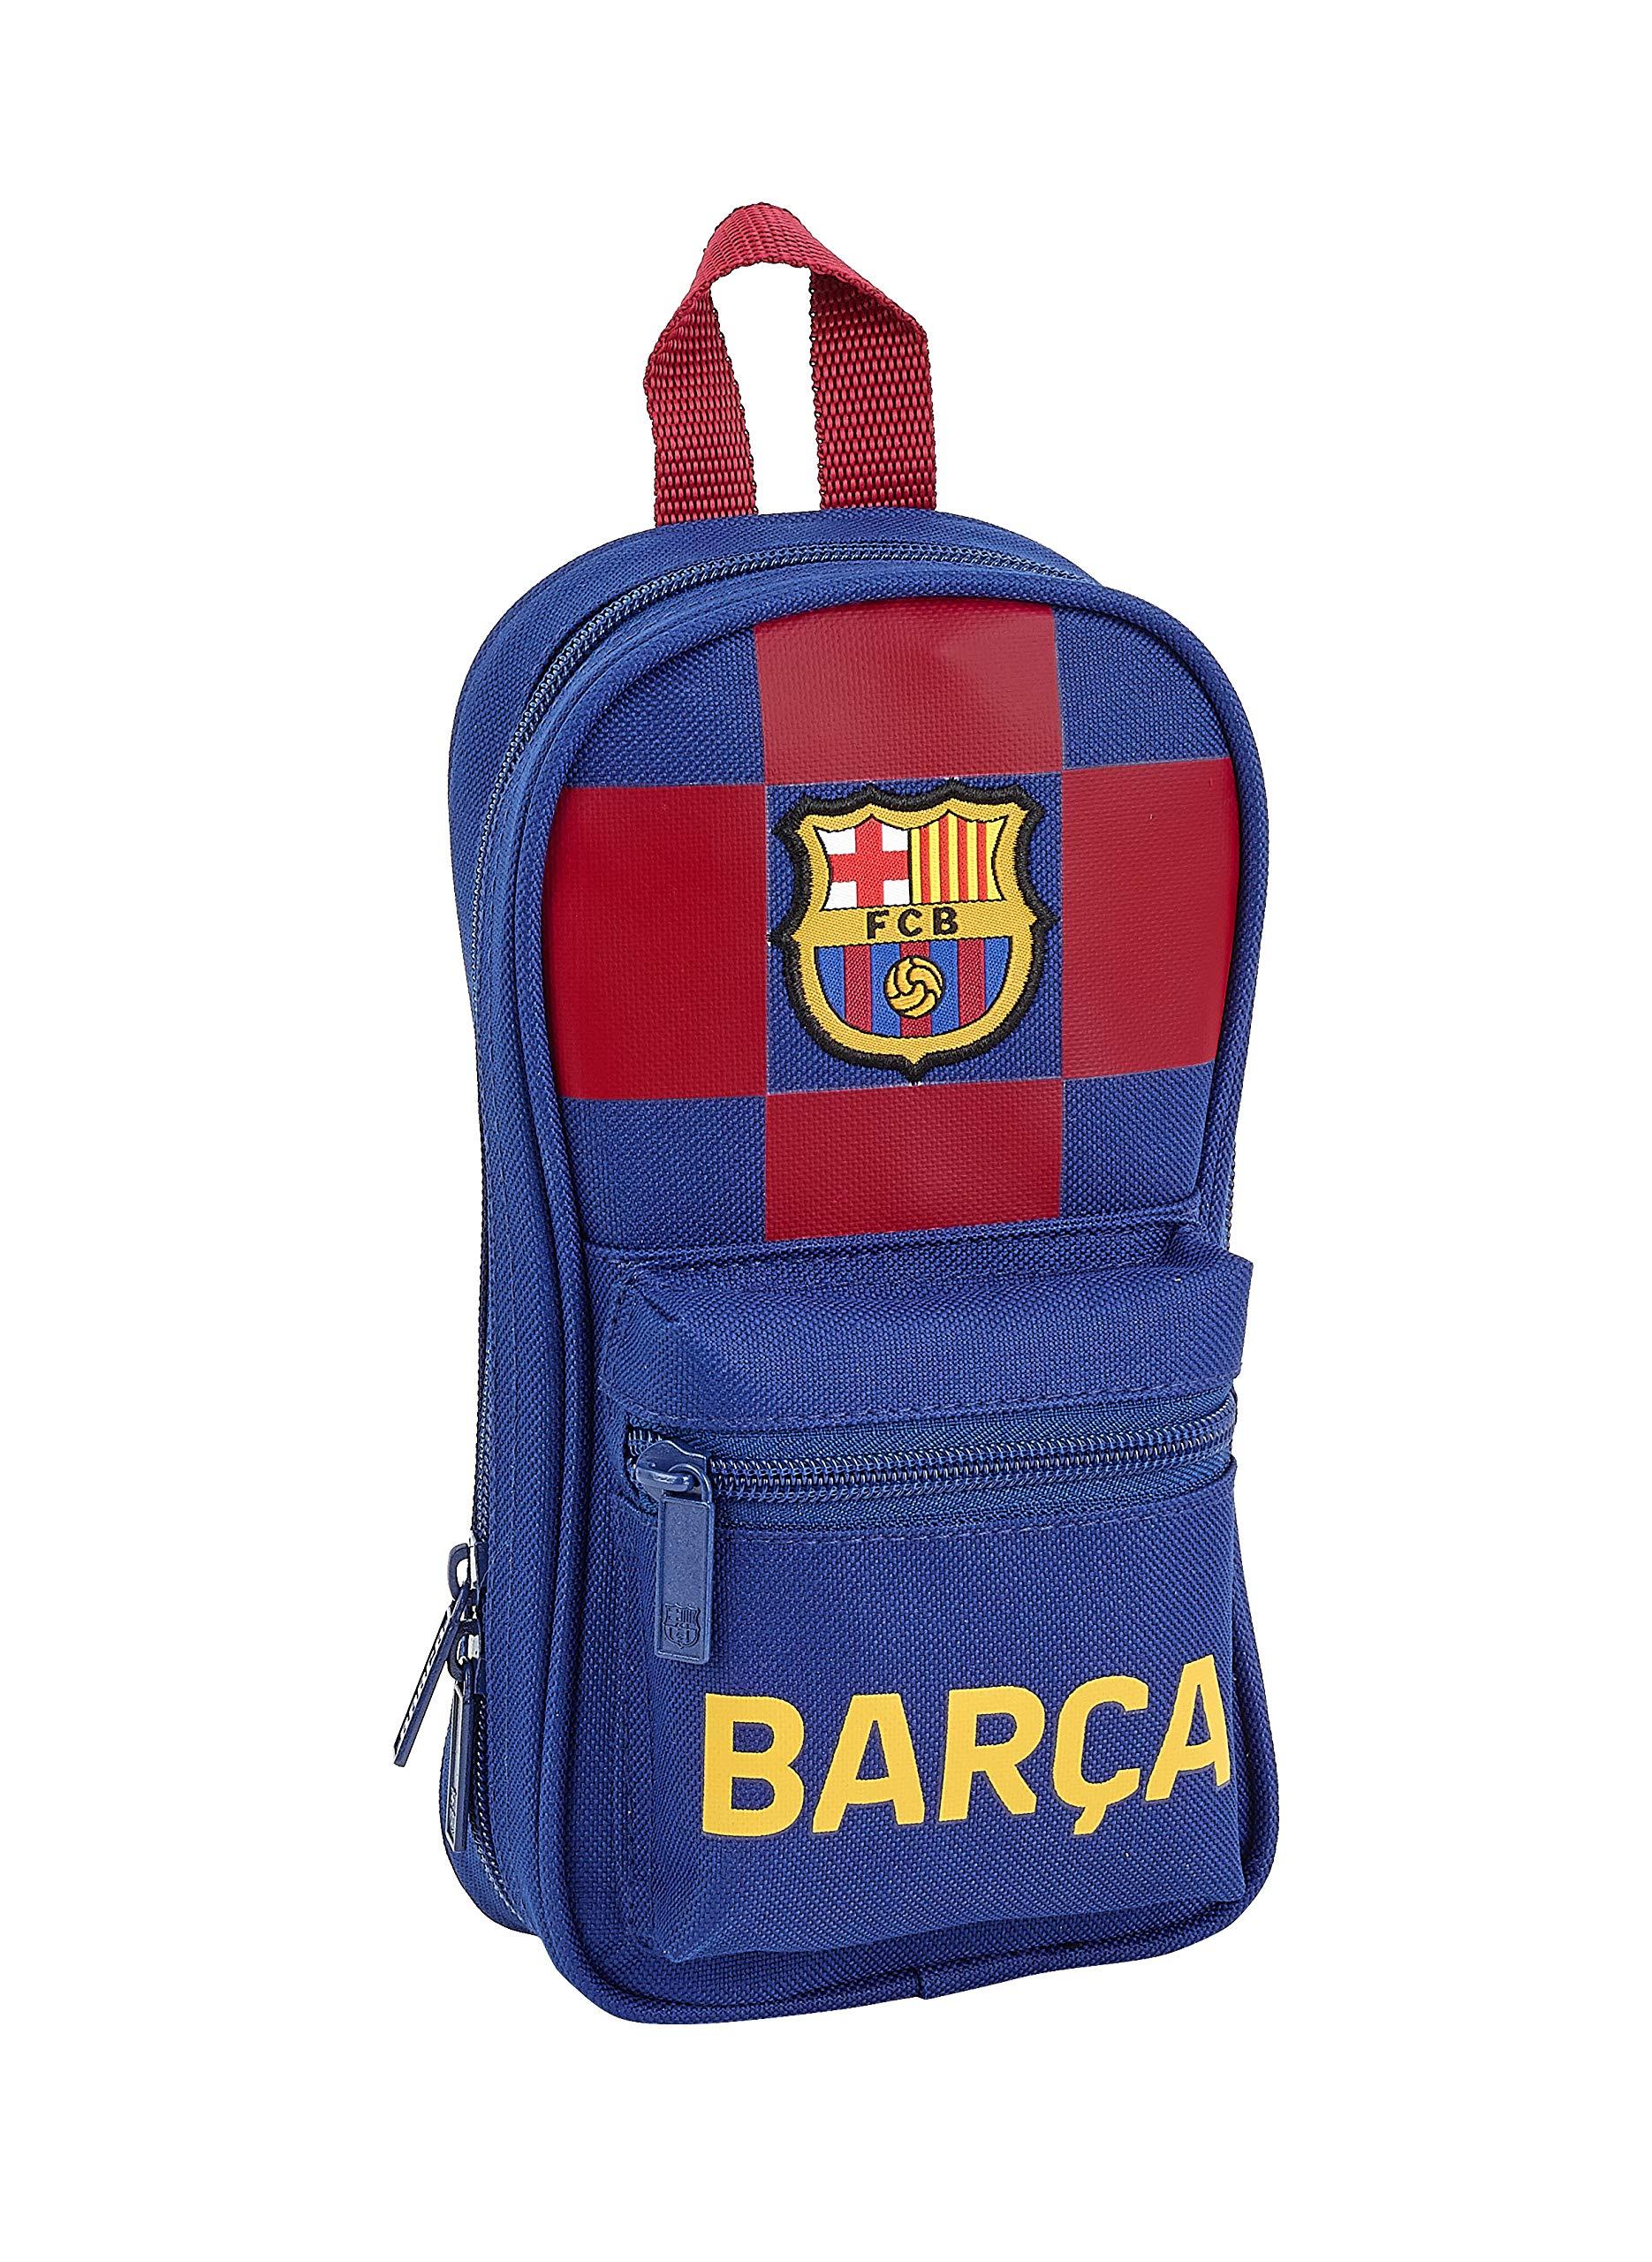 FC Barcelona Plumier Mochila 4 Estuches llenos, 33 Piezas, Escolar